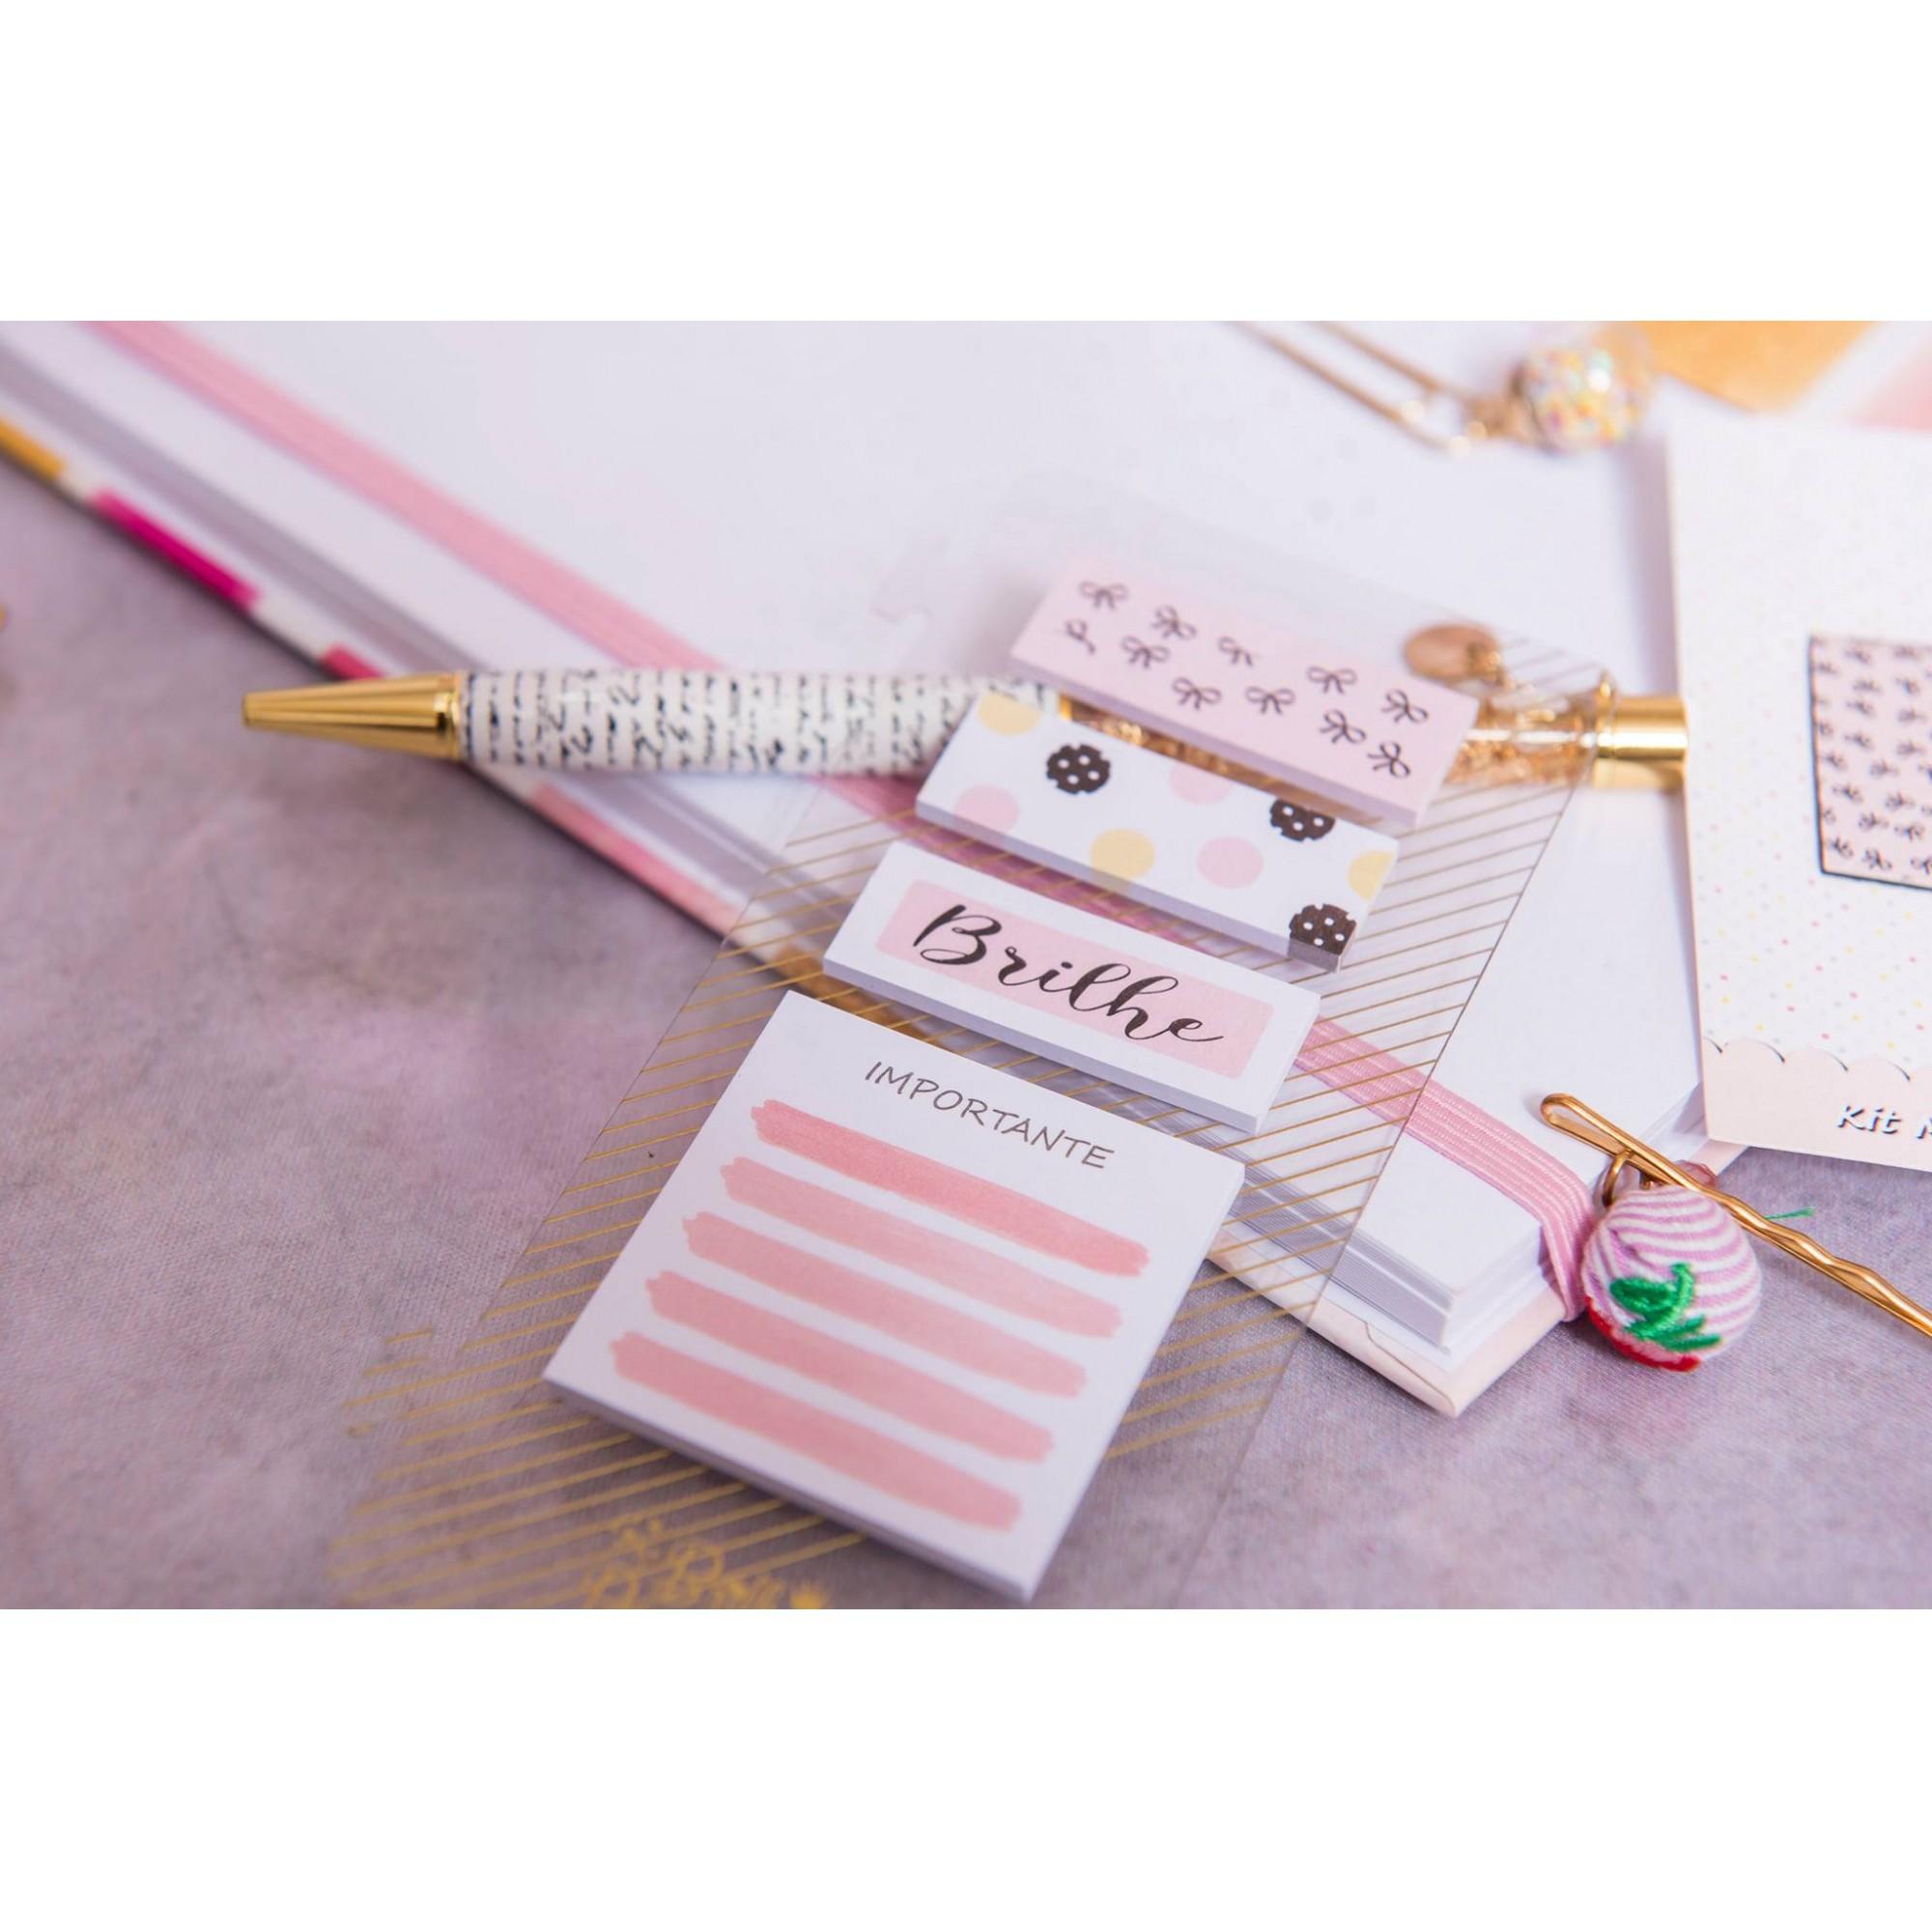 Kit niver Sticky notes e kit escolar